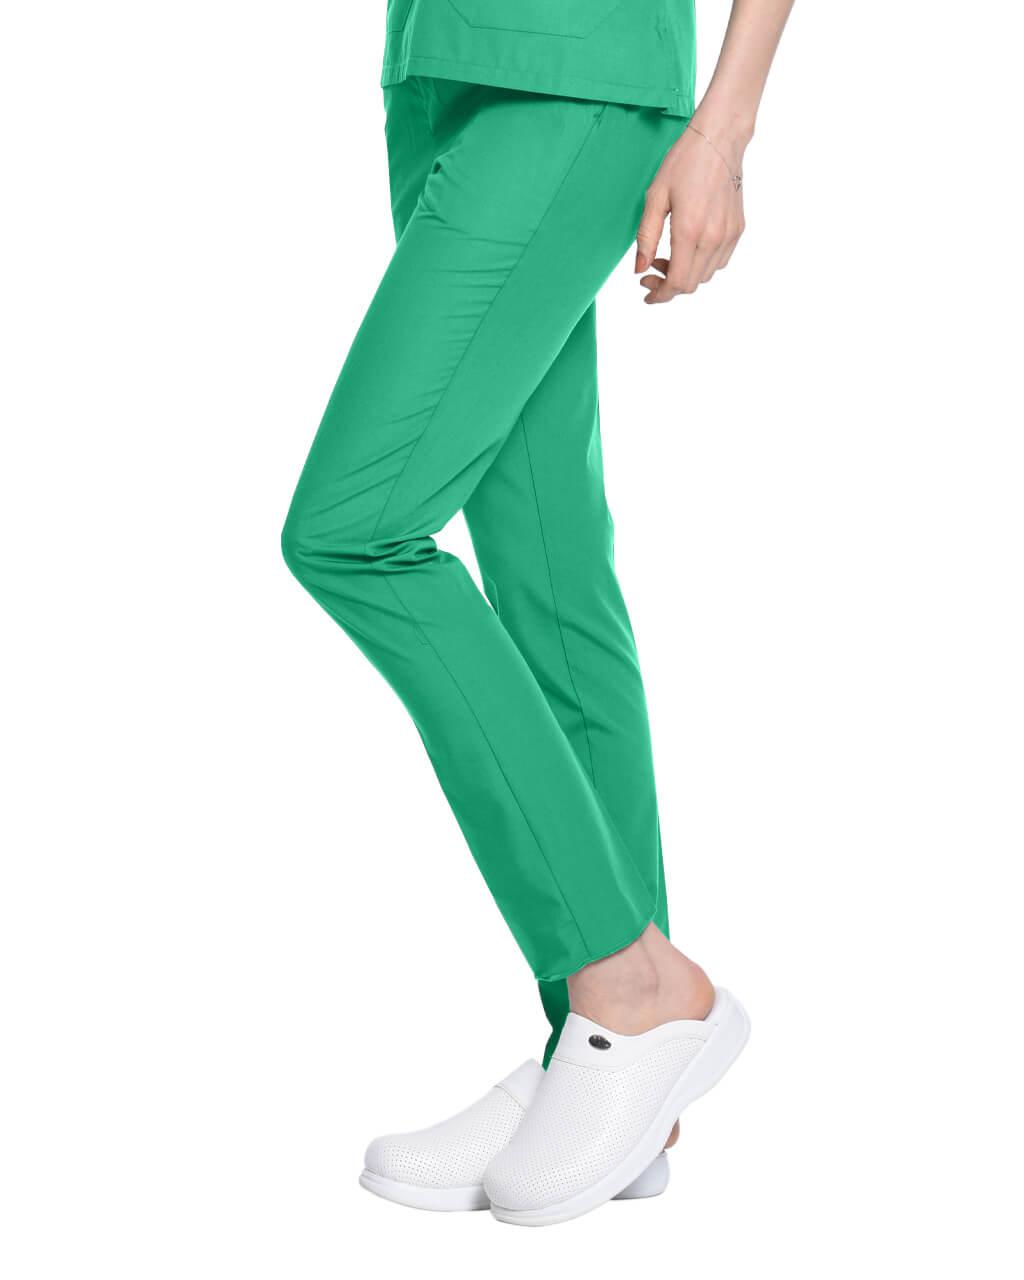 Terrycotton Petrol Yeşili Pantolon